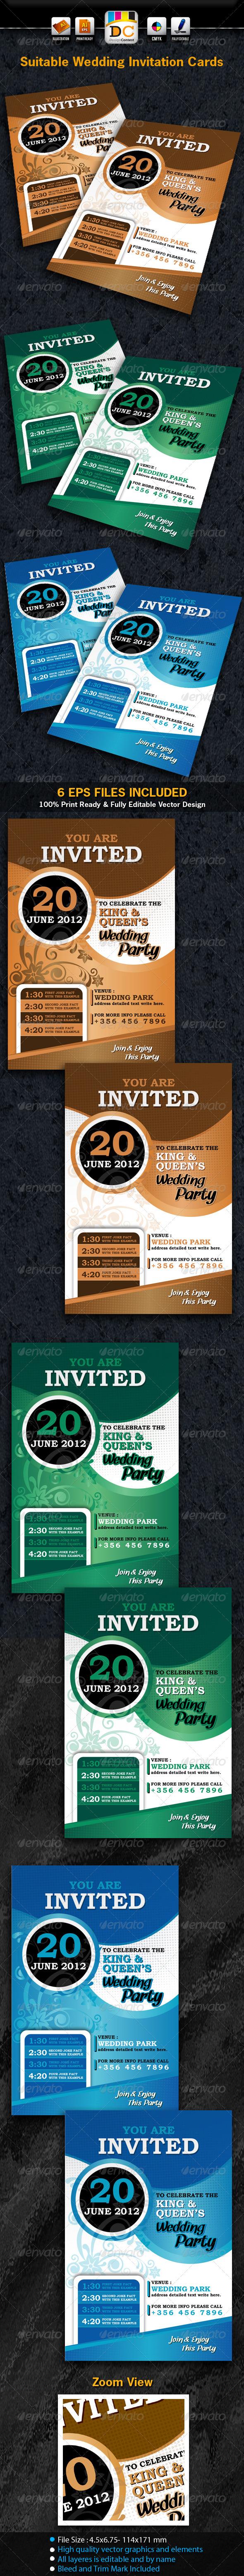 Suitable Wedding/Marriage Invitation Card Sets - Weddings Cards & Invites